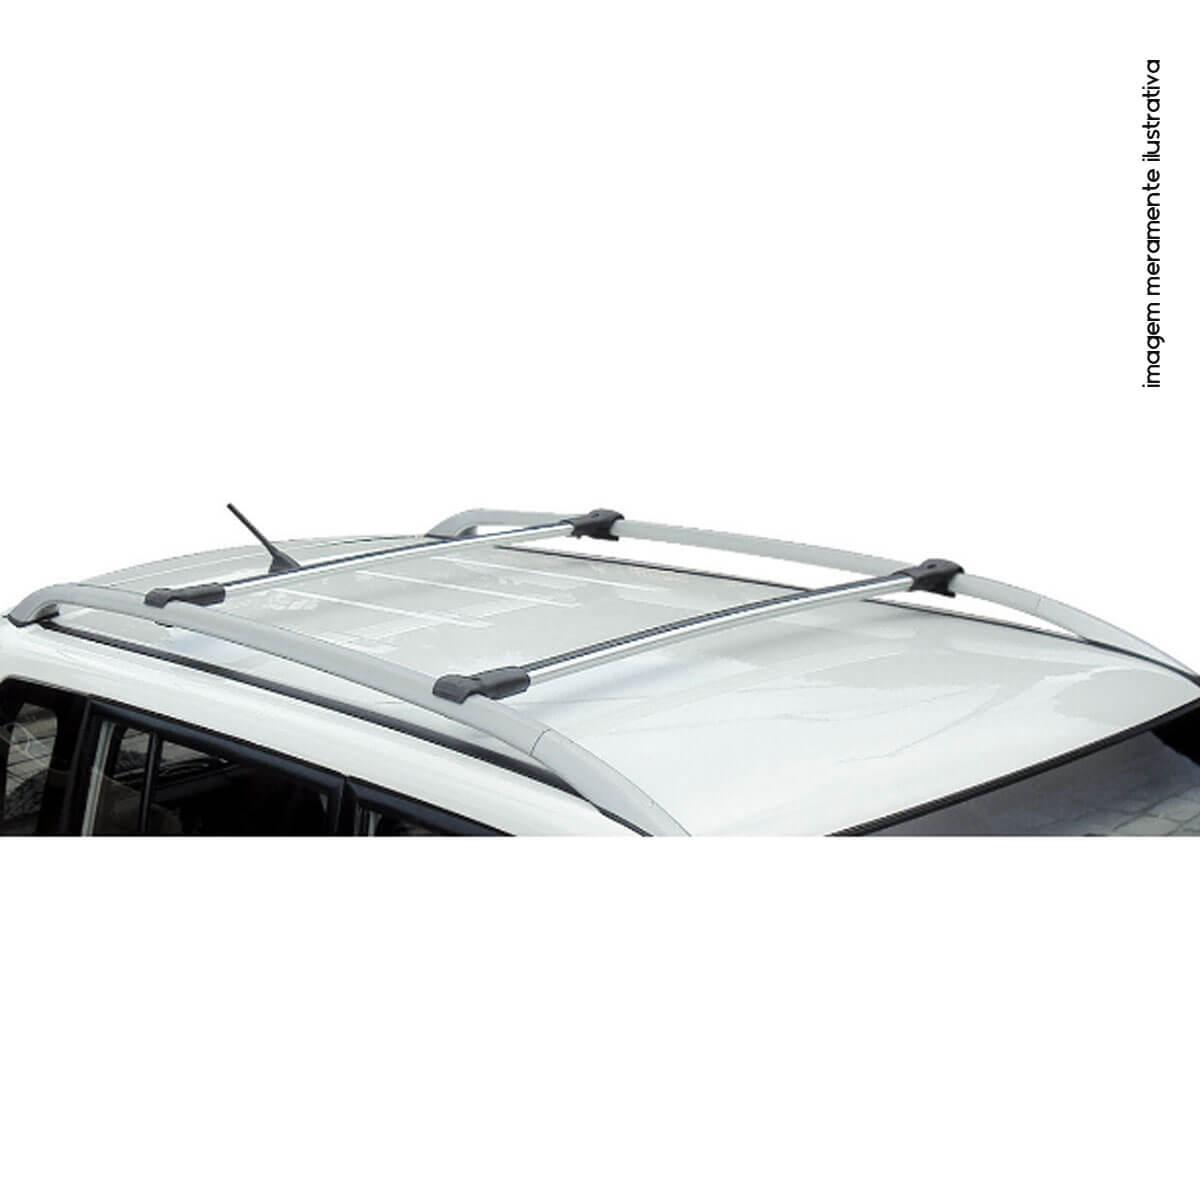 Travessa rack de teto larga alumínio RAV4 2013 a 2018